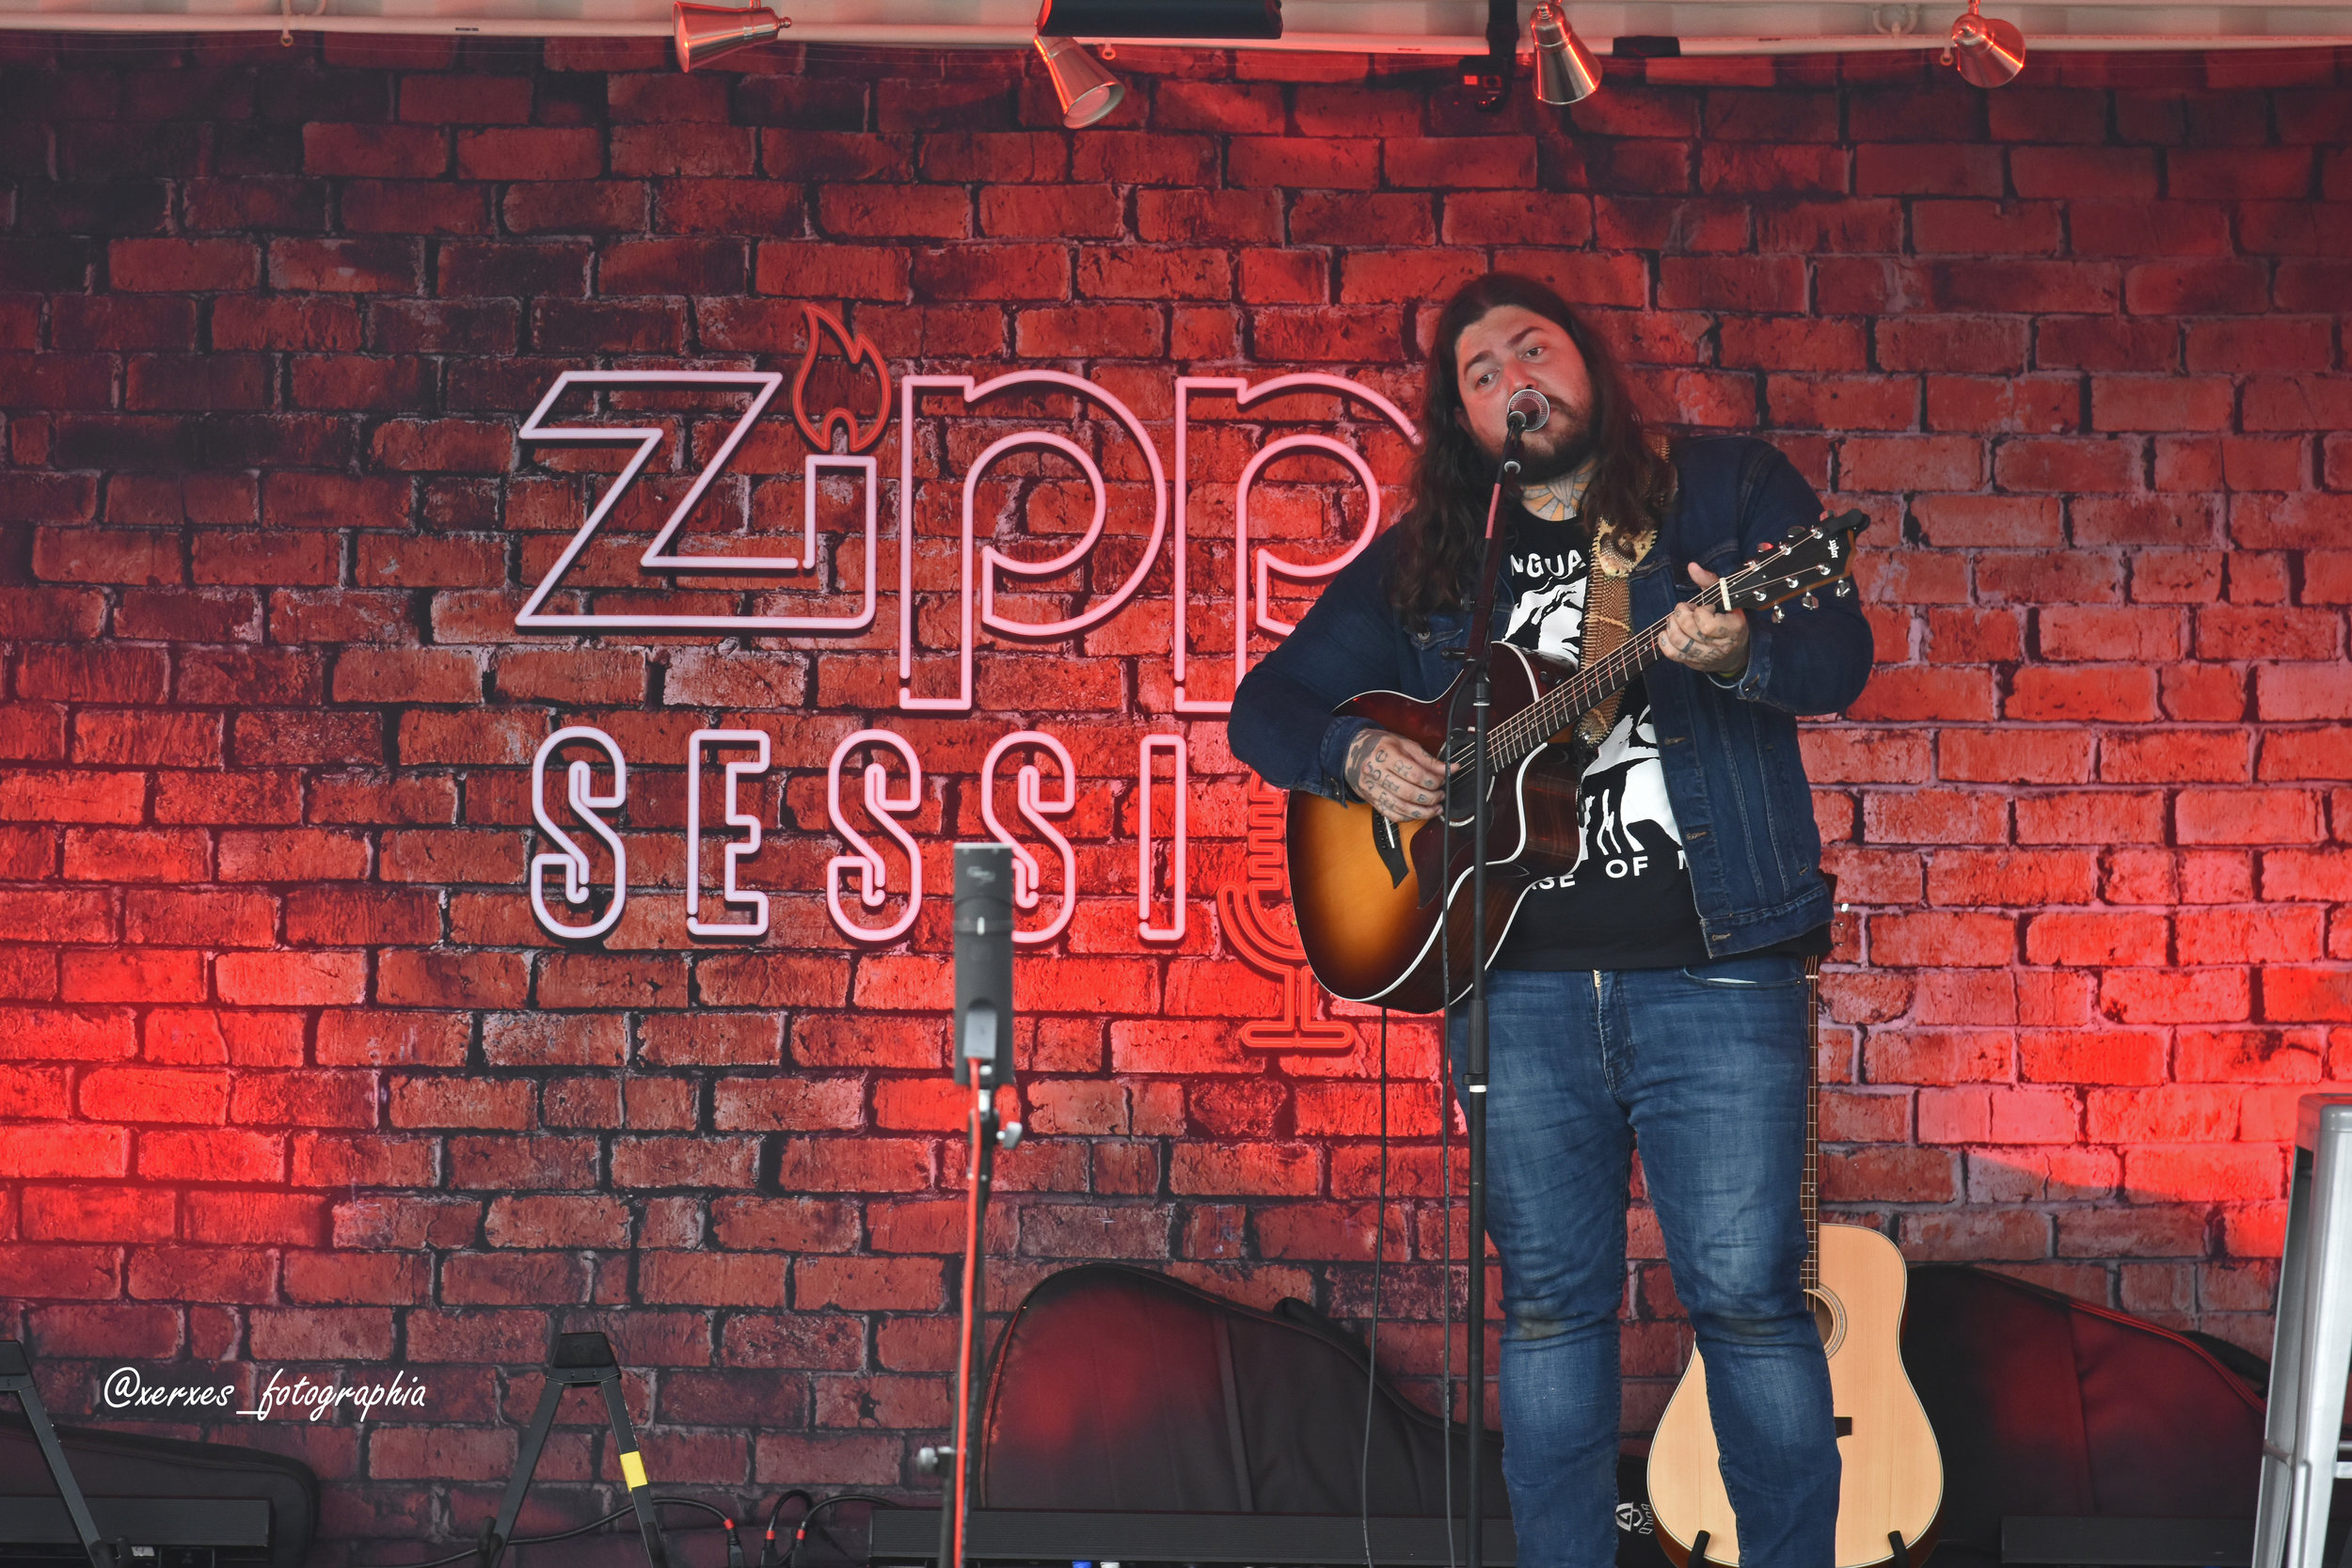 Zippo Sessions - Amigo the Devil